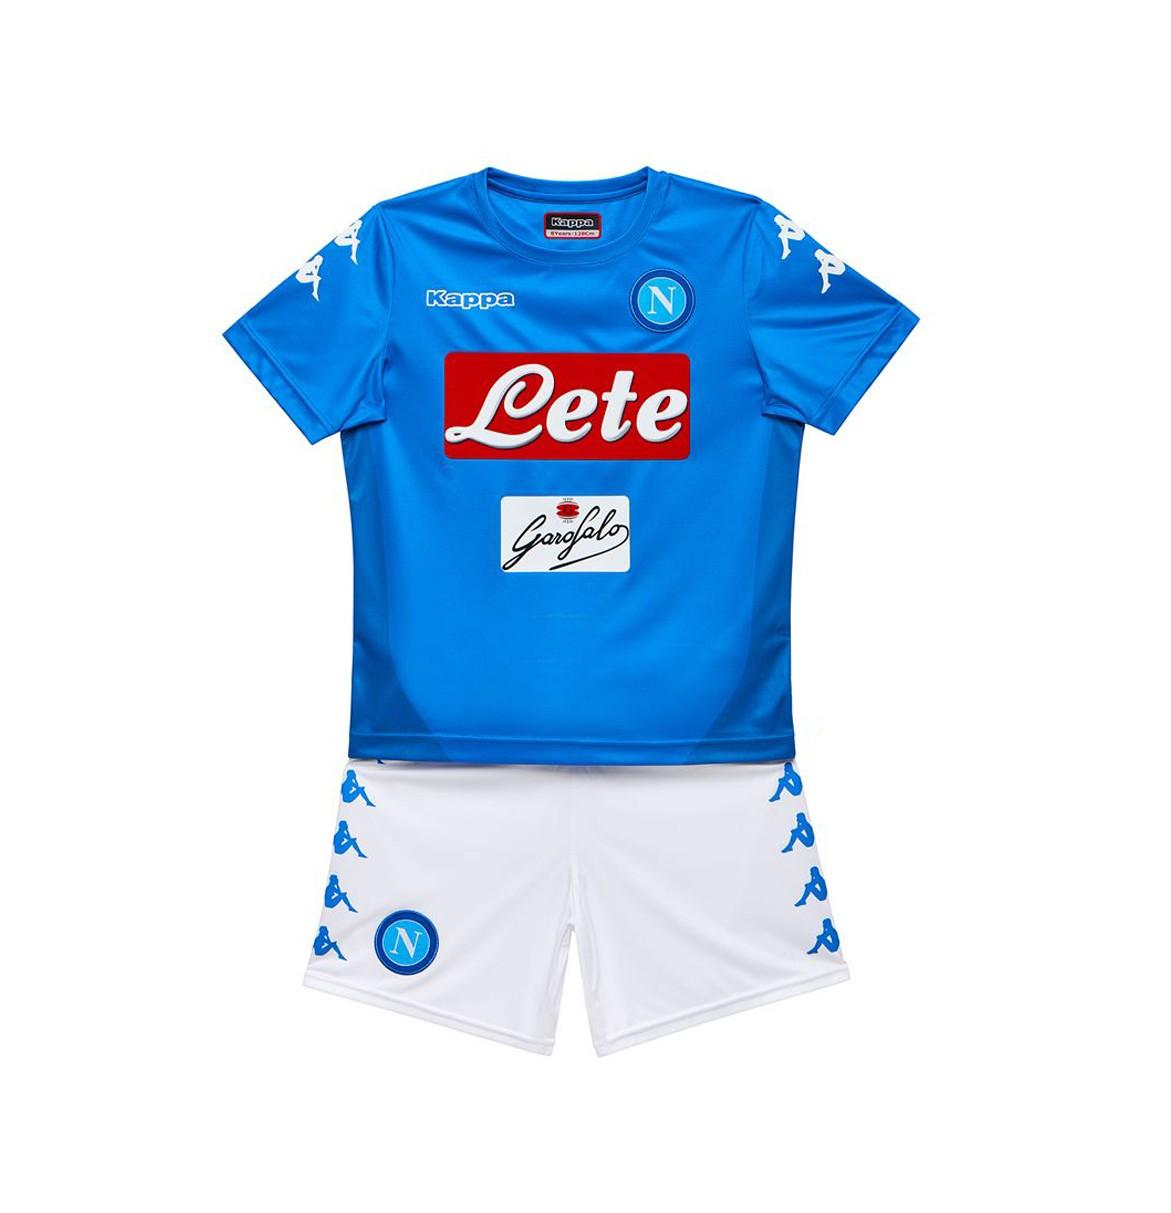 01a71753664 SSC Napoli jersey shorts home baby 2017 18 Kappa